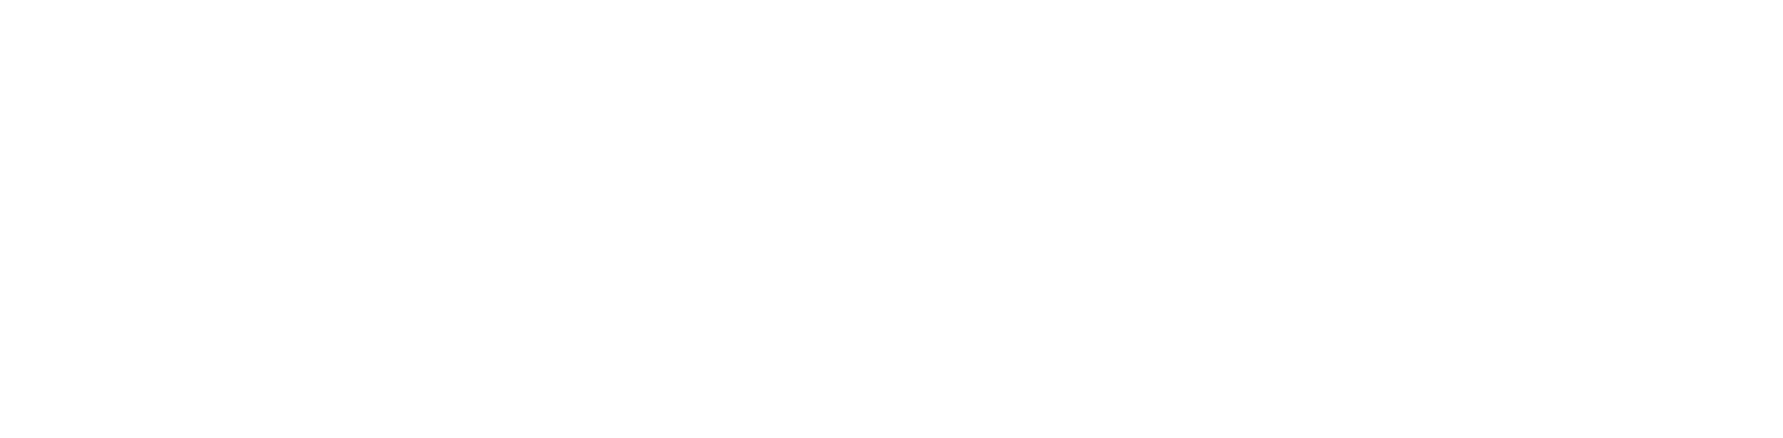 Logo Rockwell Automation Allen Bradley